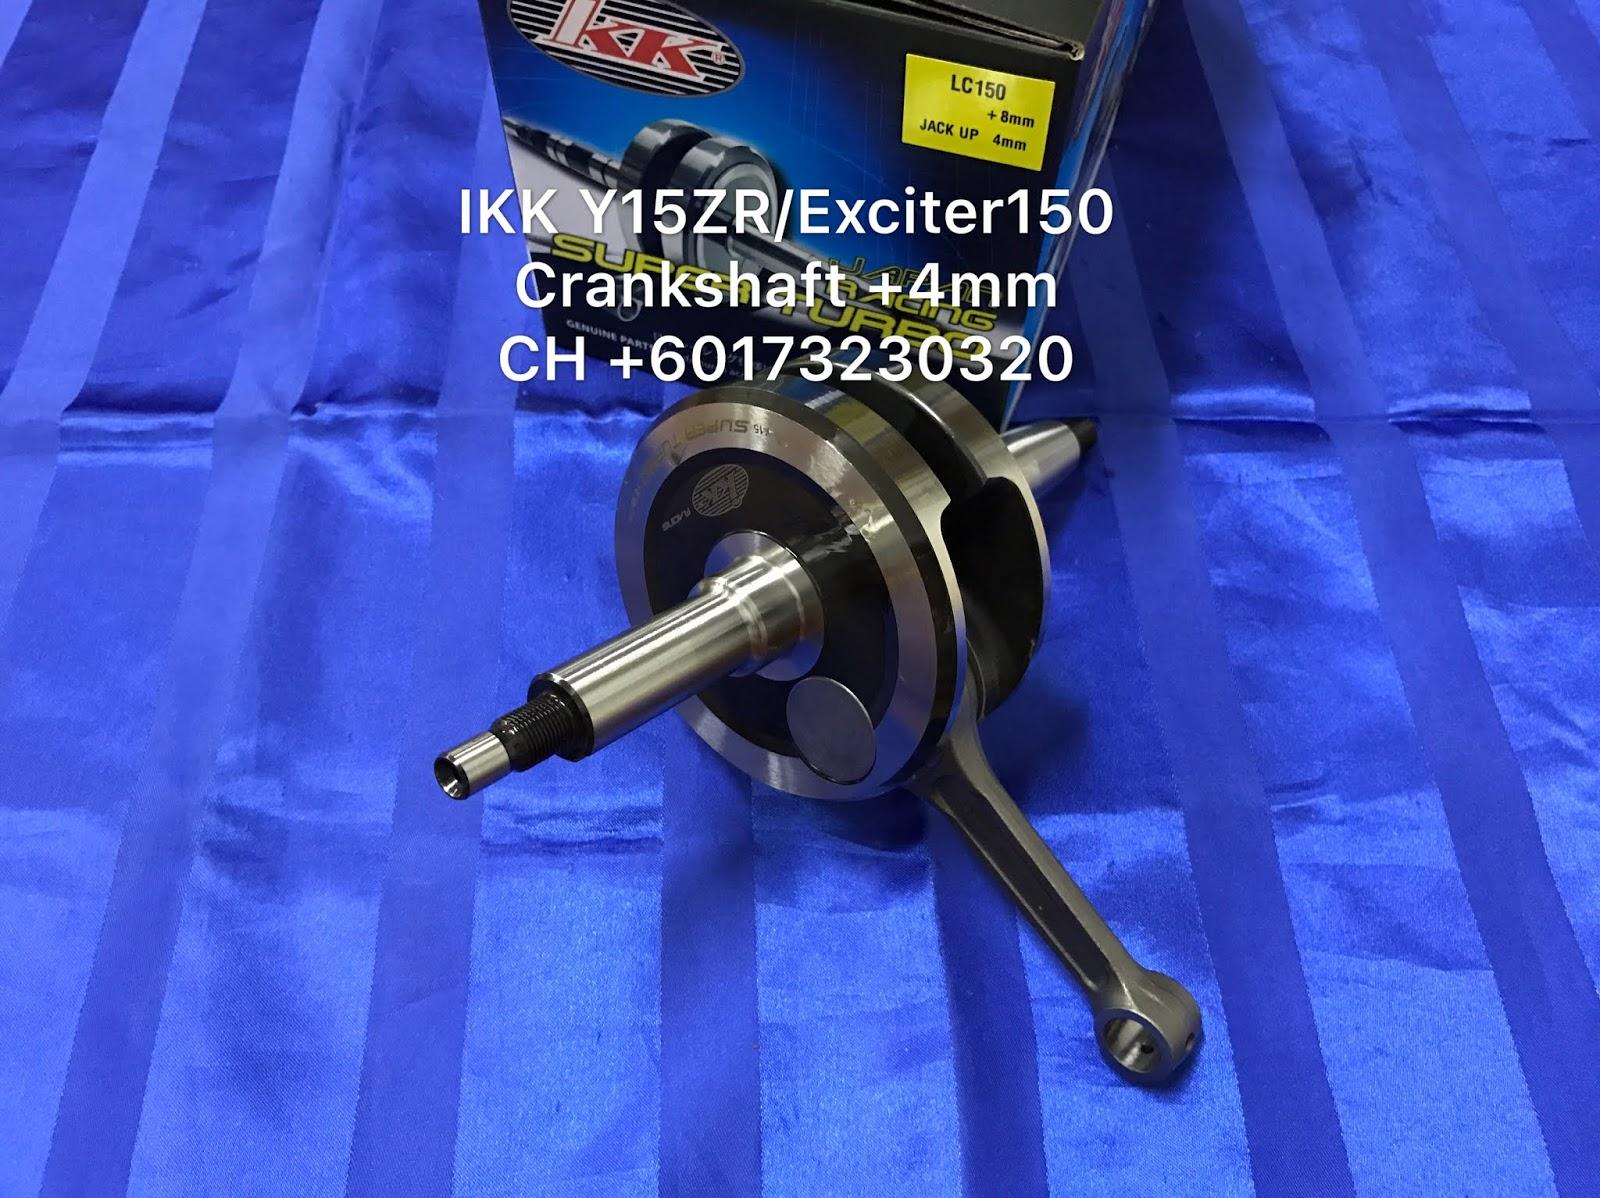 CH Motorcycle Store: IKK Y15ZR Crankshaft +4mm